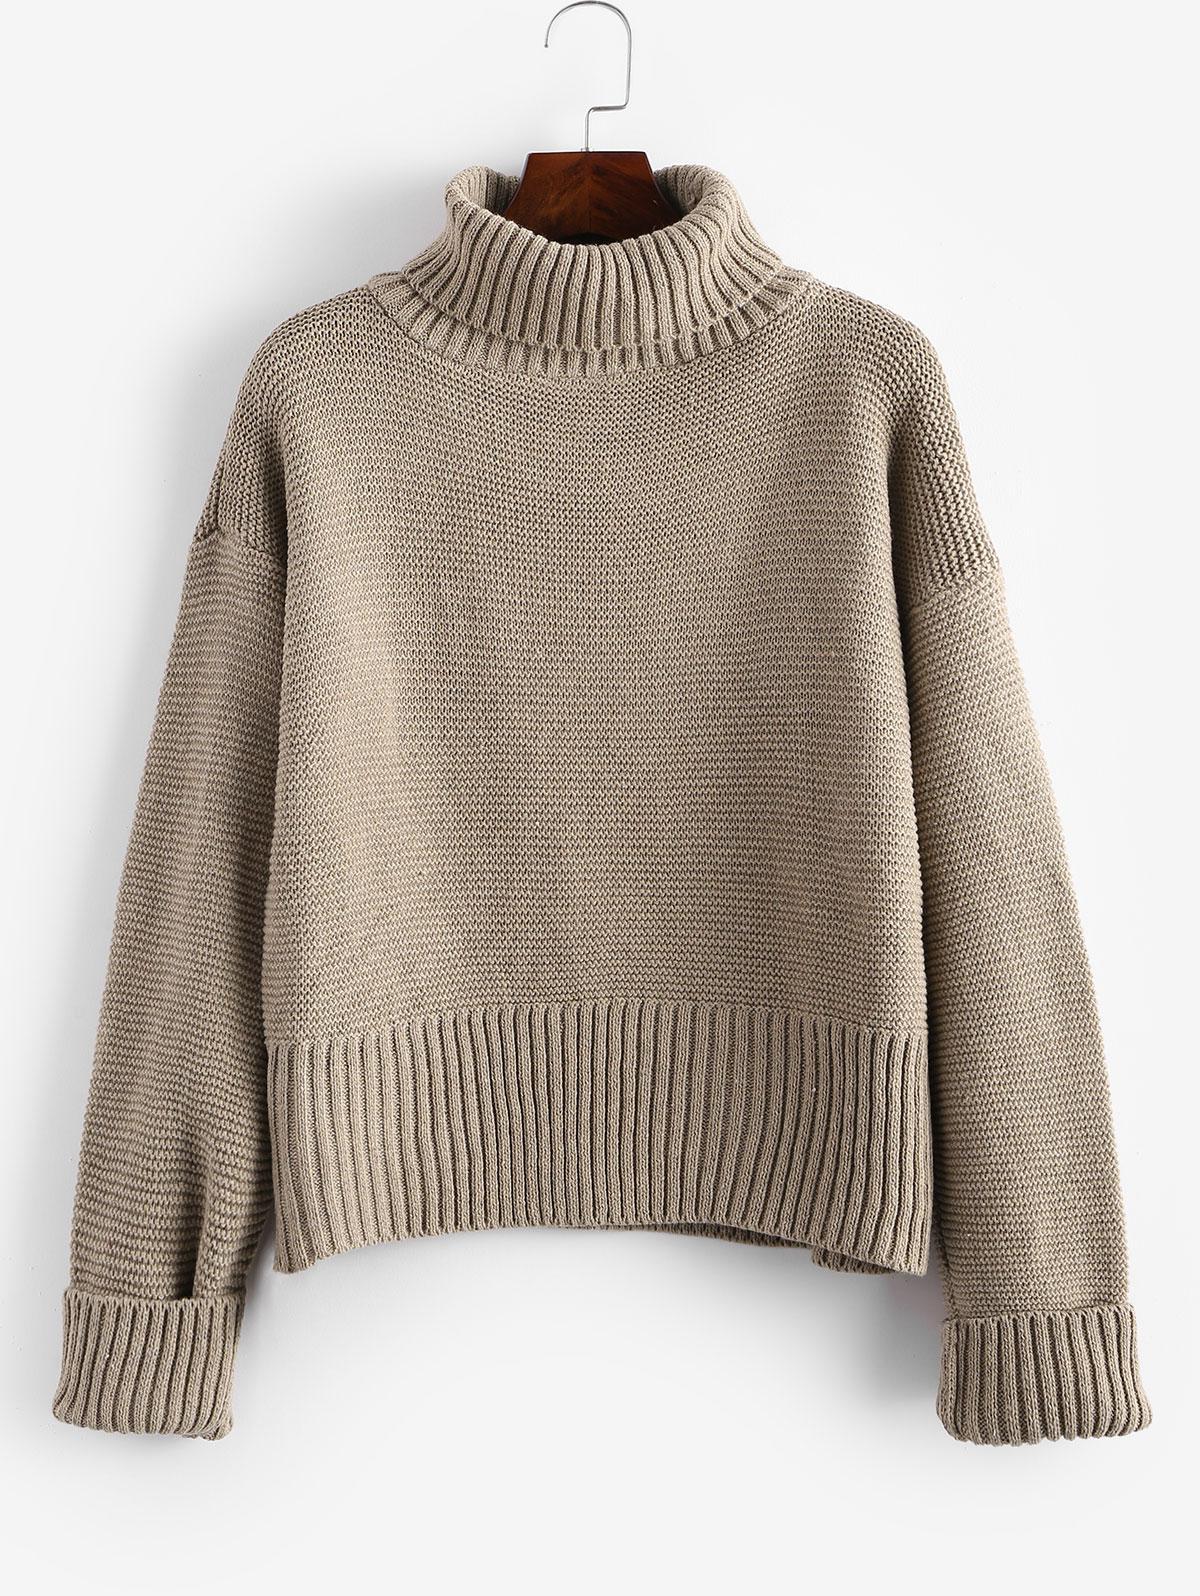 Turtleneck Drop Shoulder Cuff Sleeve Sweater